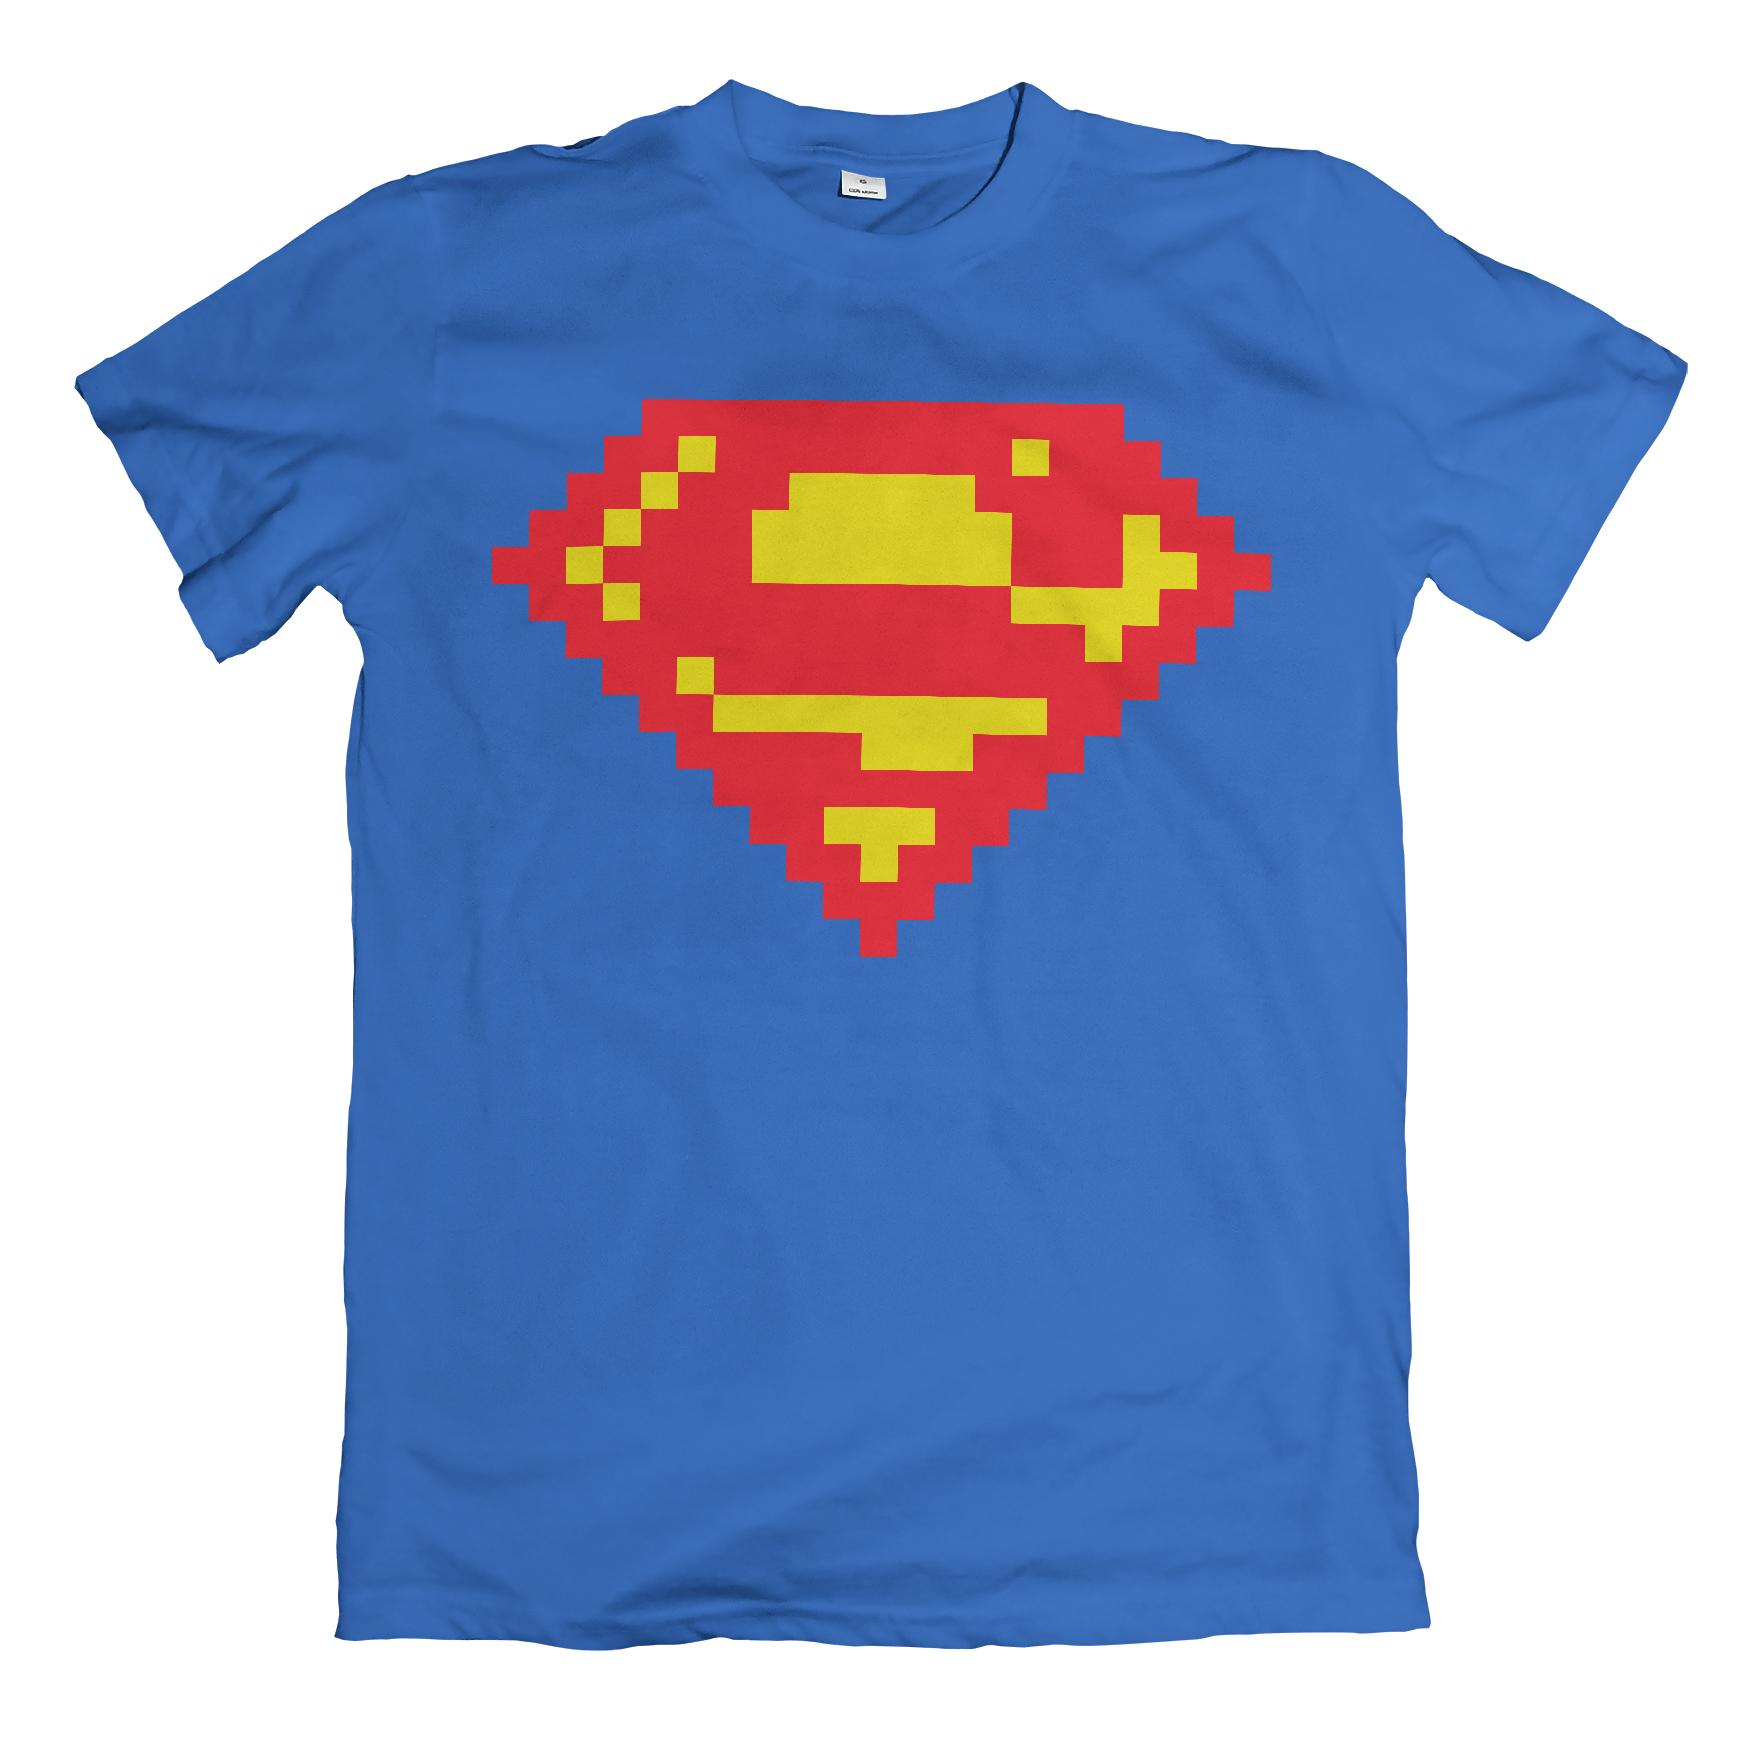 Super - It means 'Hope'